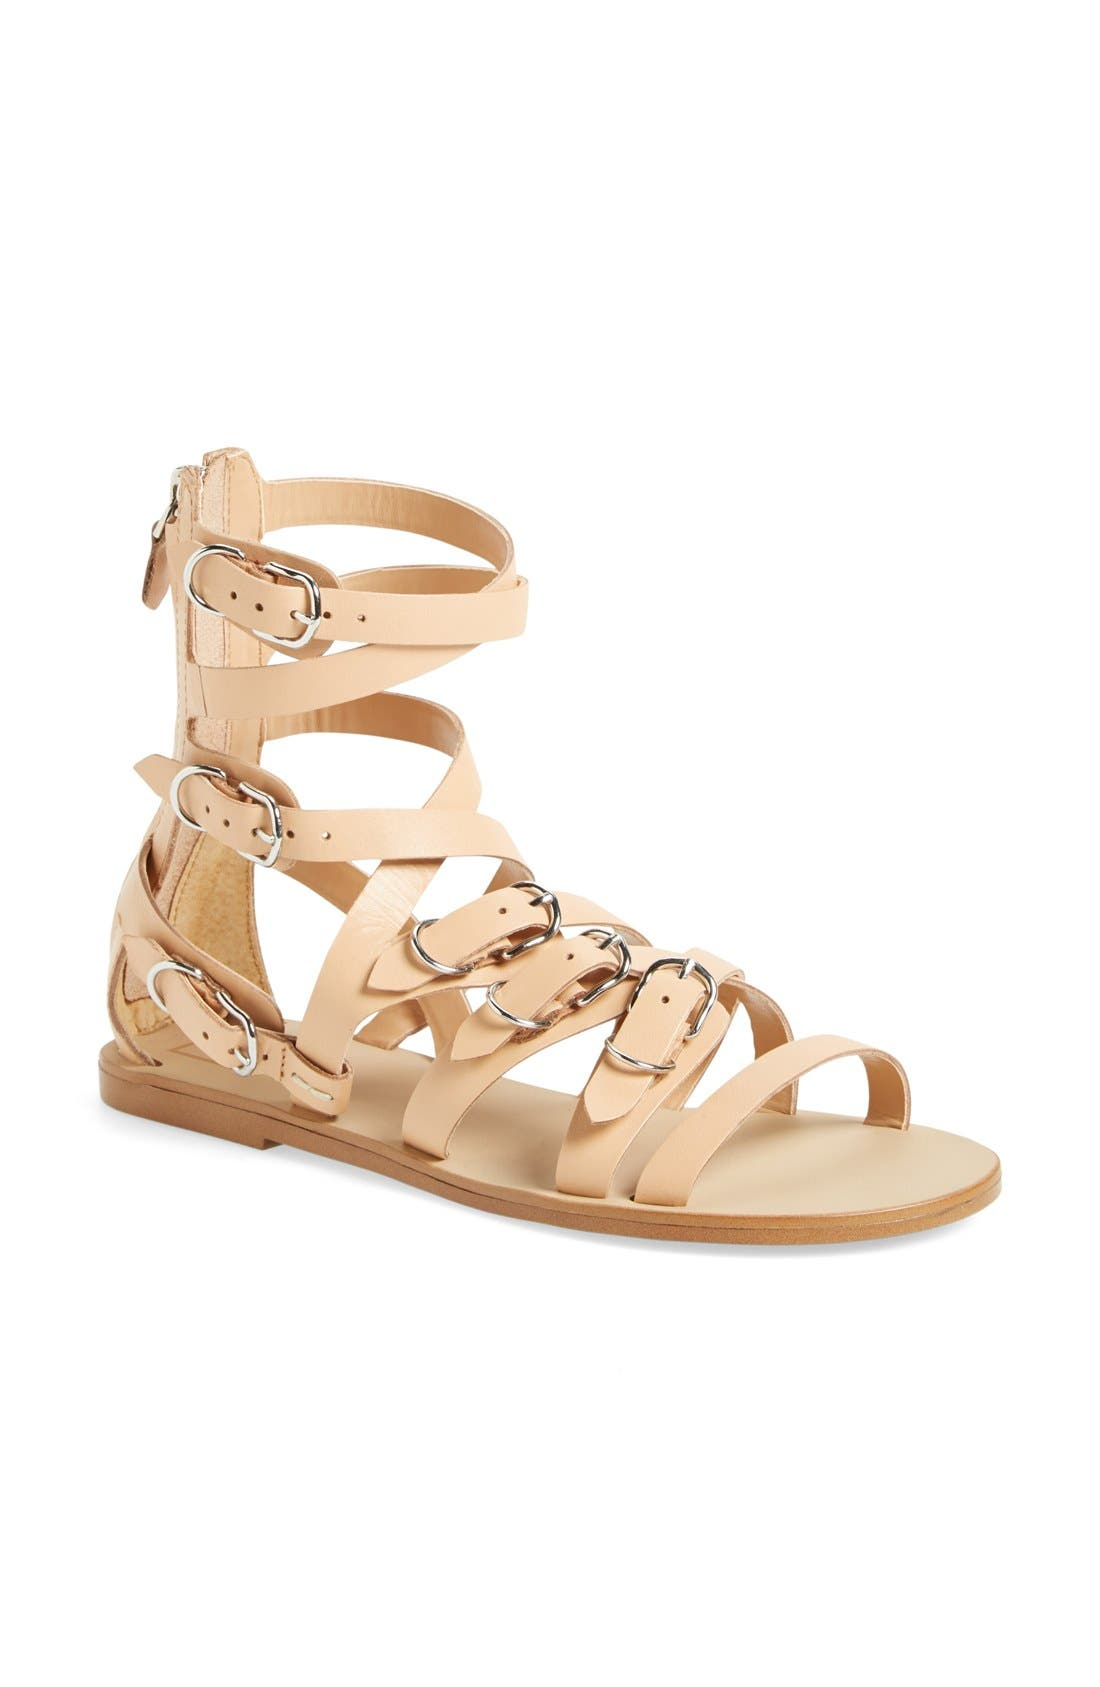 Alternate Image 1 Selected - DV by Dolce Vita 'Okena' Leather Gladiator Sandal (Women)